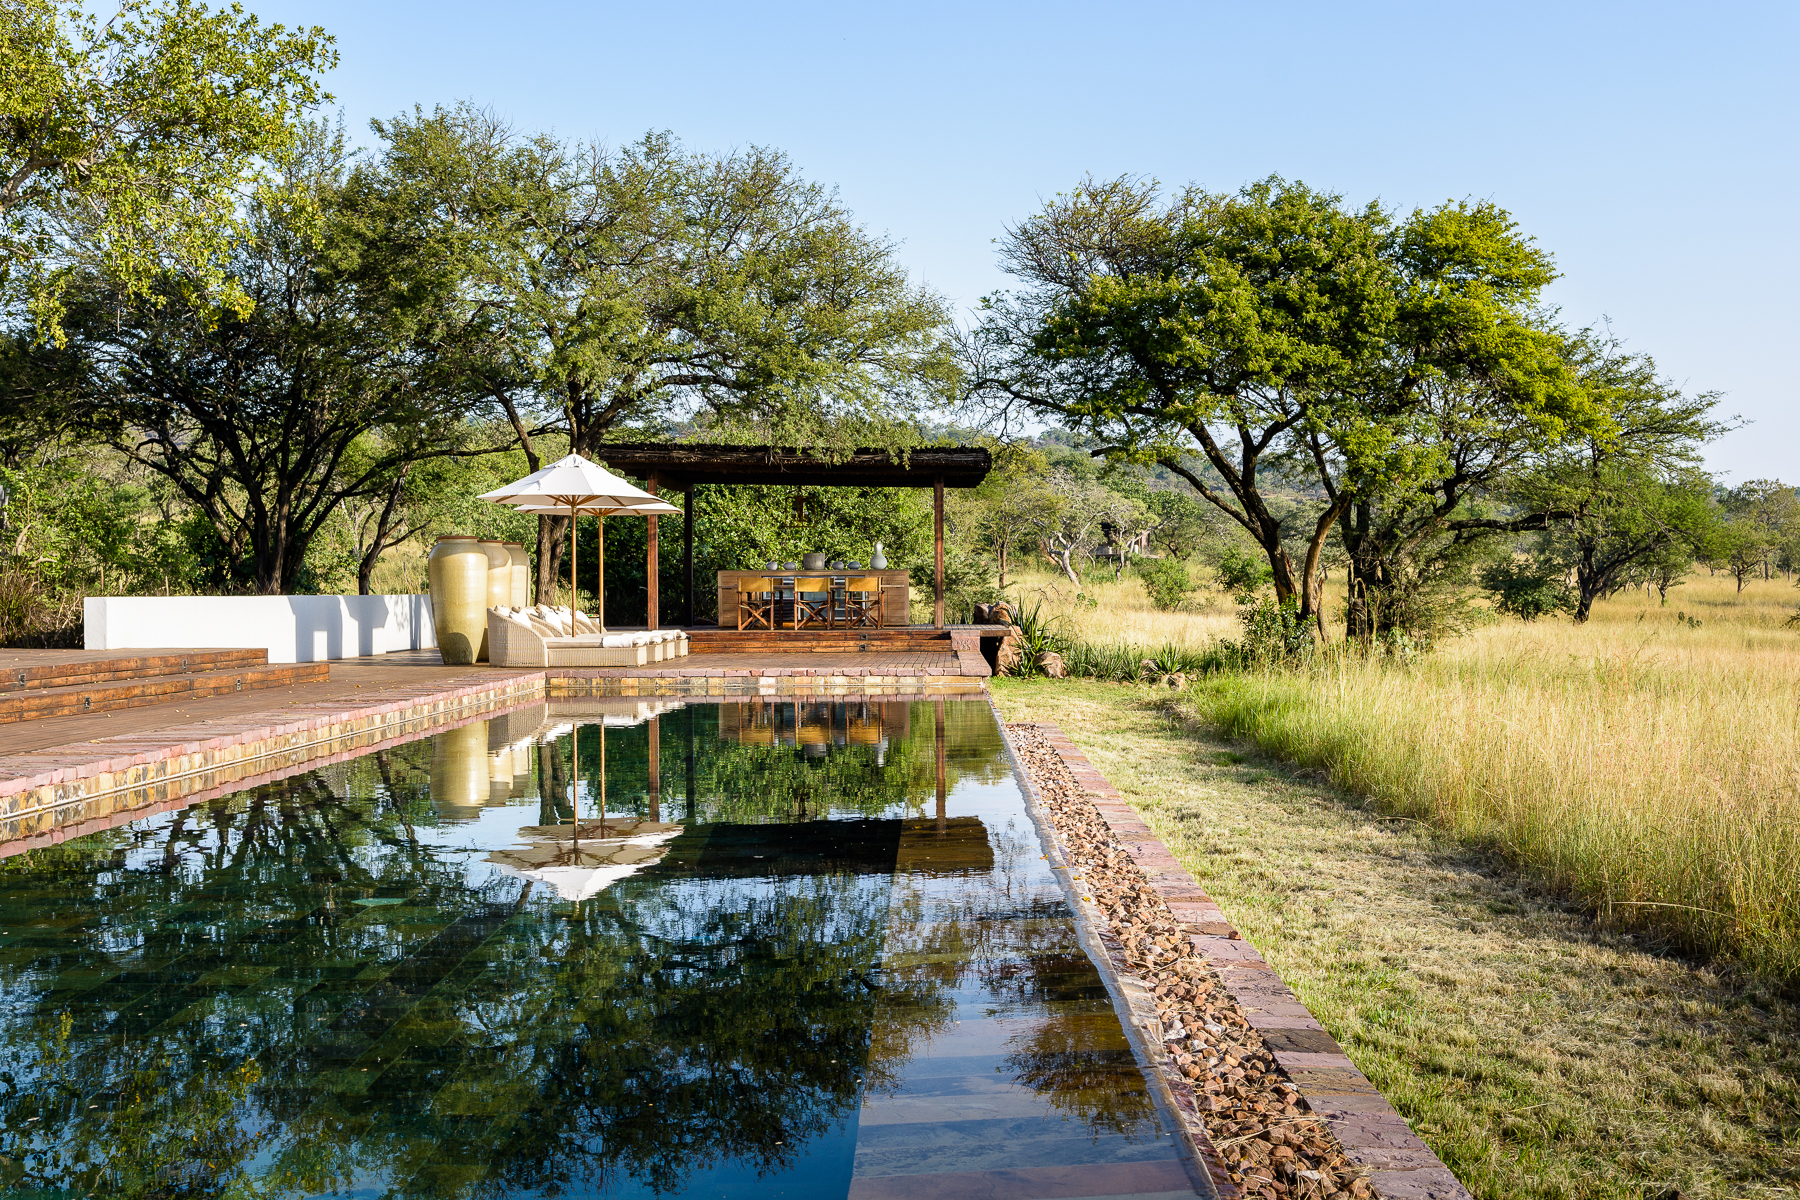 Singita Serengeti Tanzania Exterior